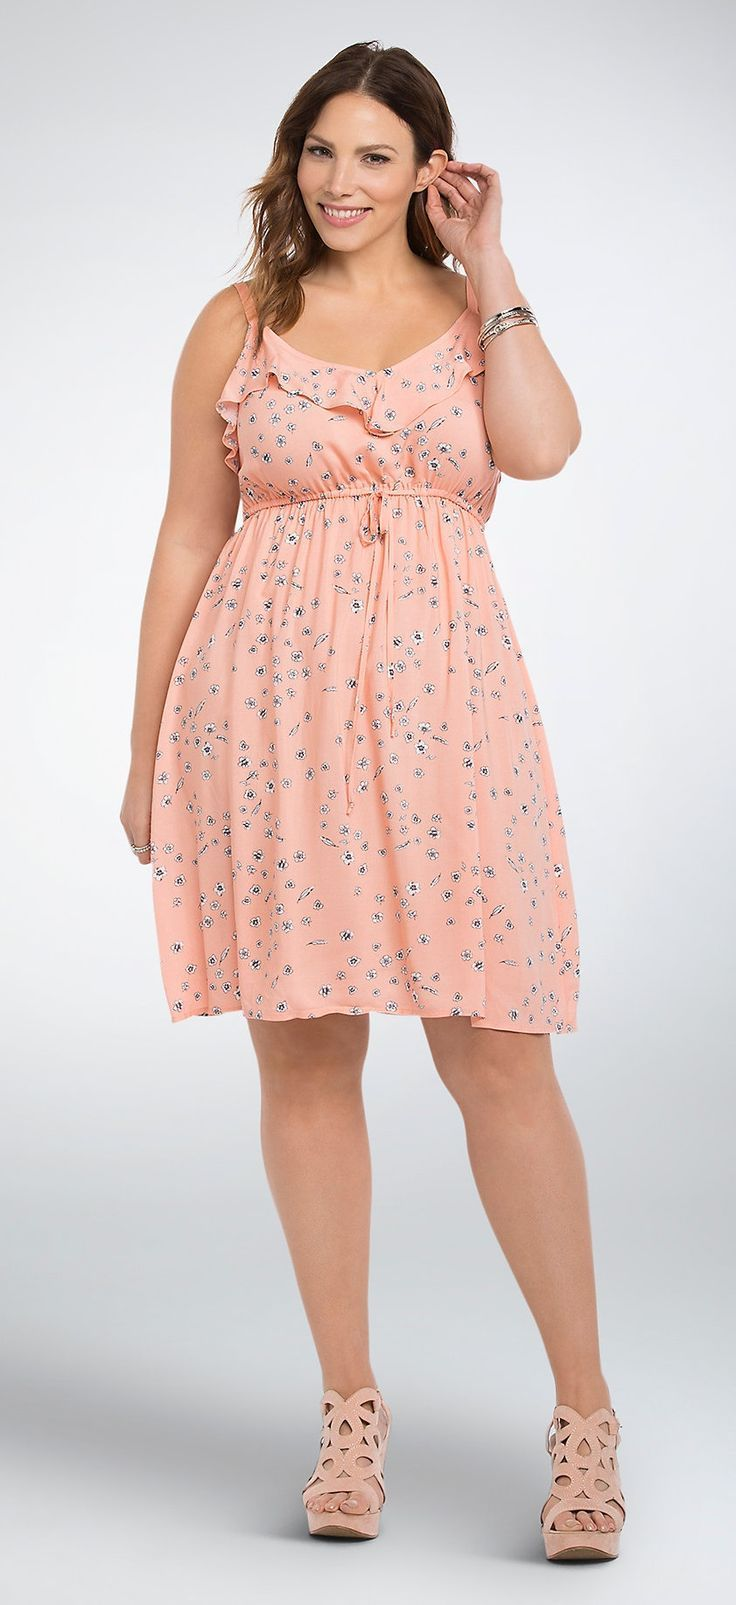 Plus Size Floral Ruffled Challis Sundress | Plus Size ...